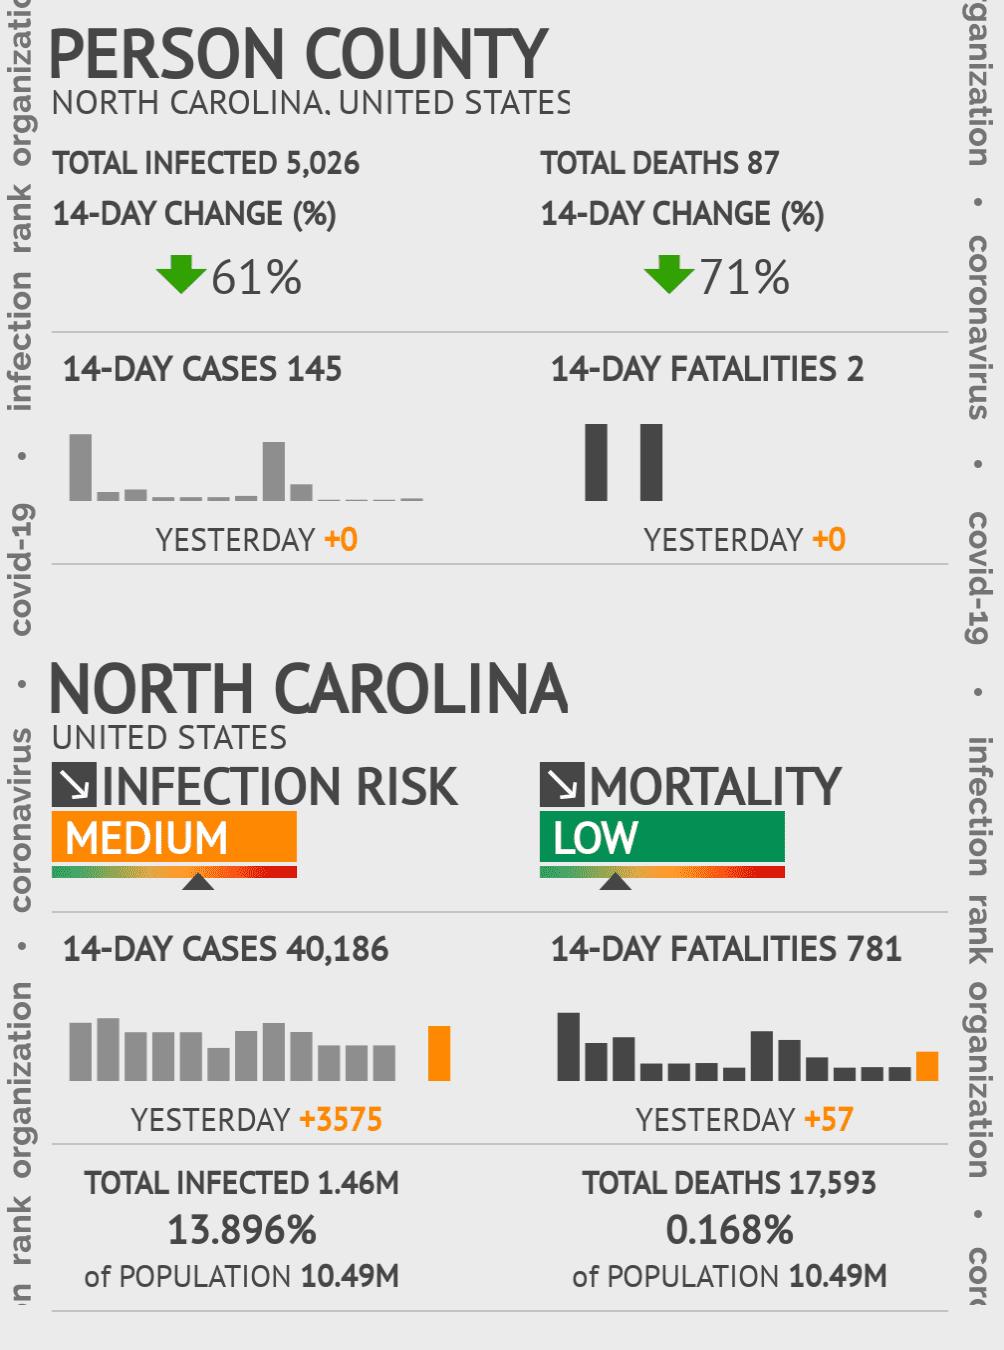 Person County Coronavirus Covid-19 Risk of Infection on November 29, 2020